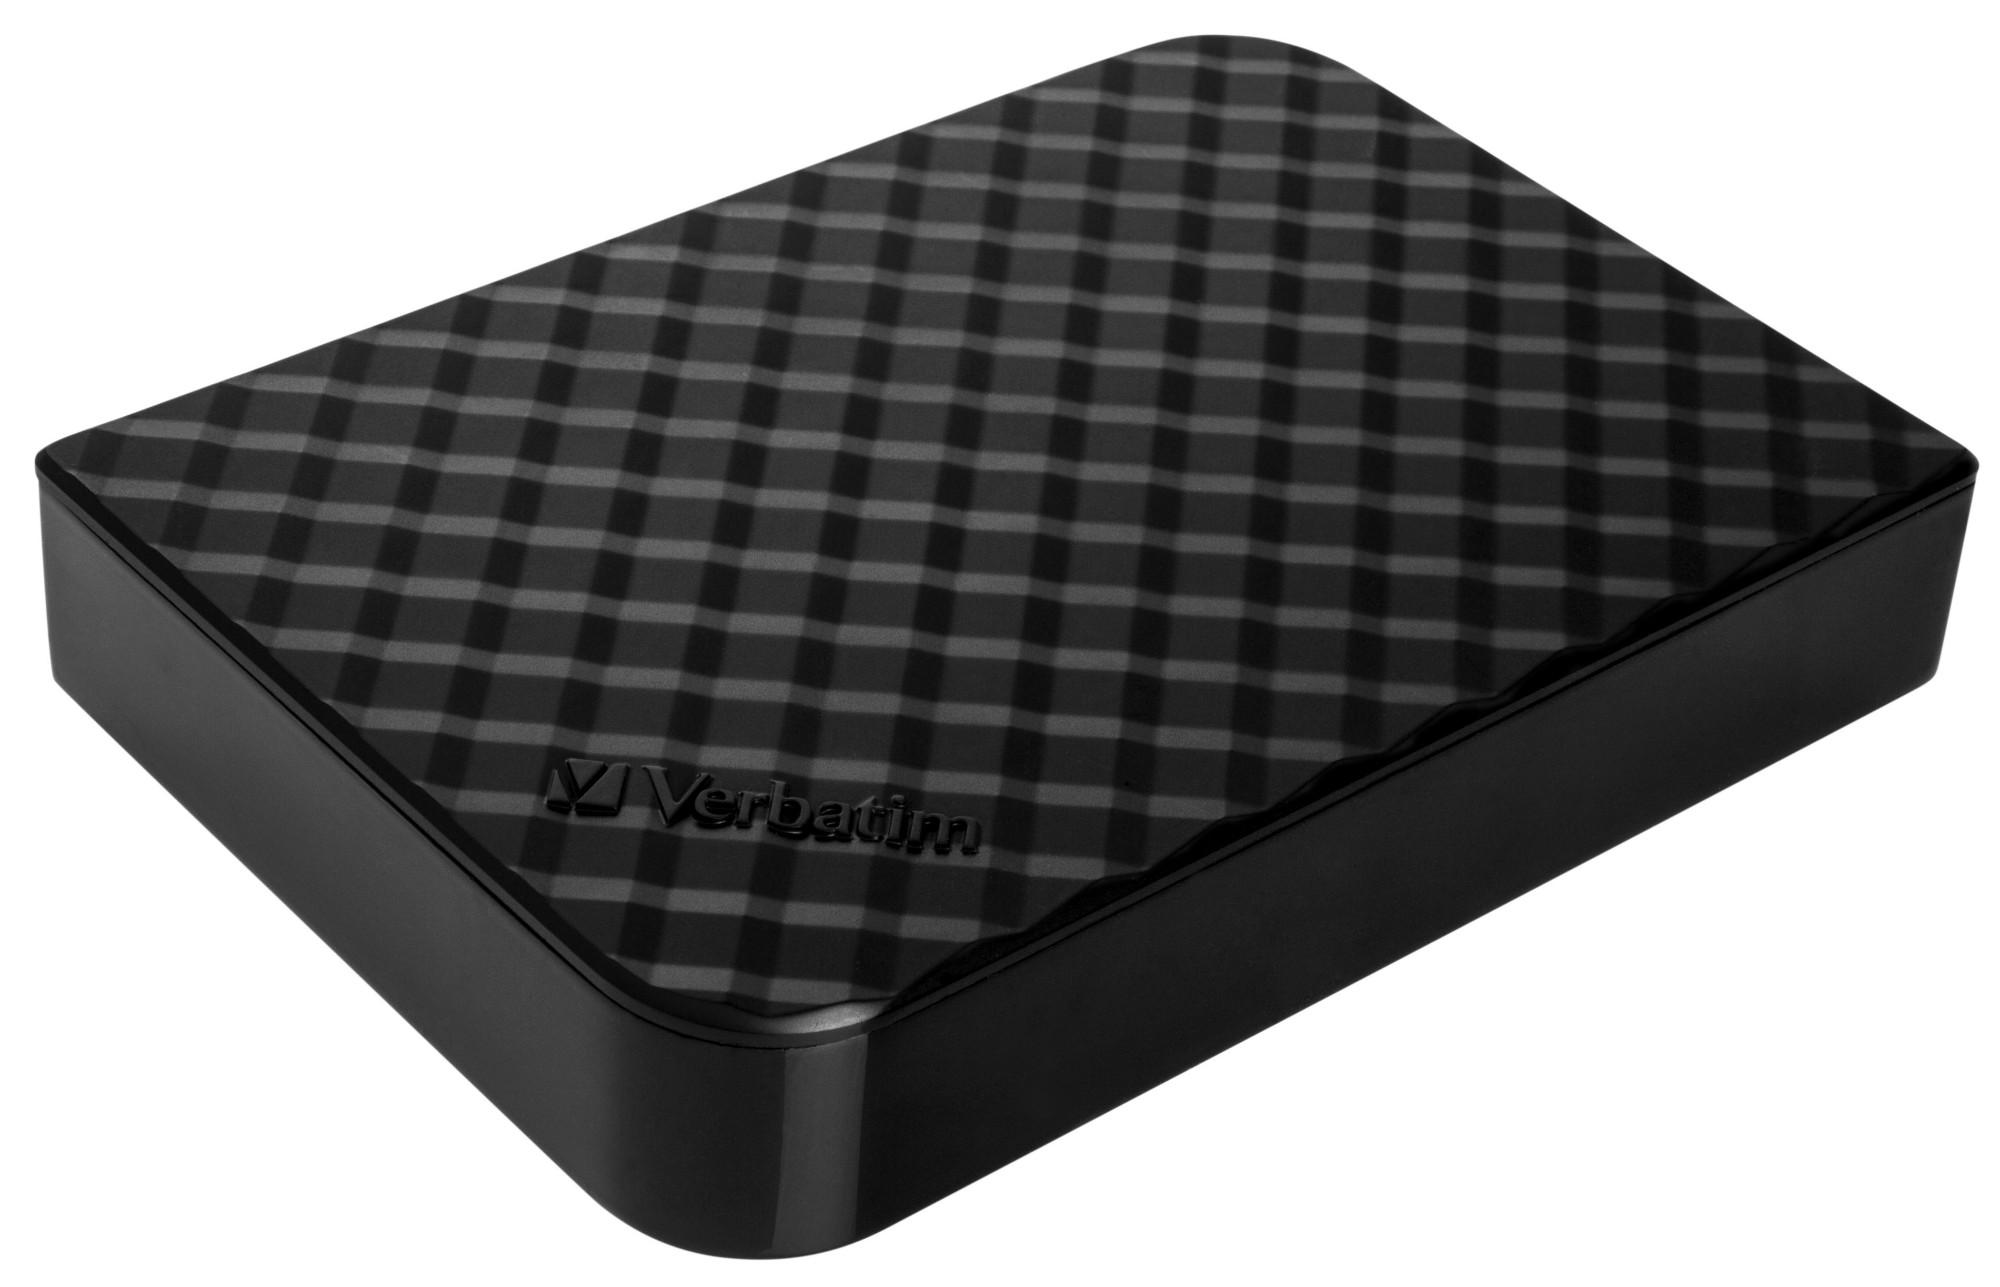 Verbatim Store 'n' Save external hard drive 8000 GB Black